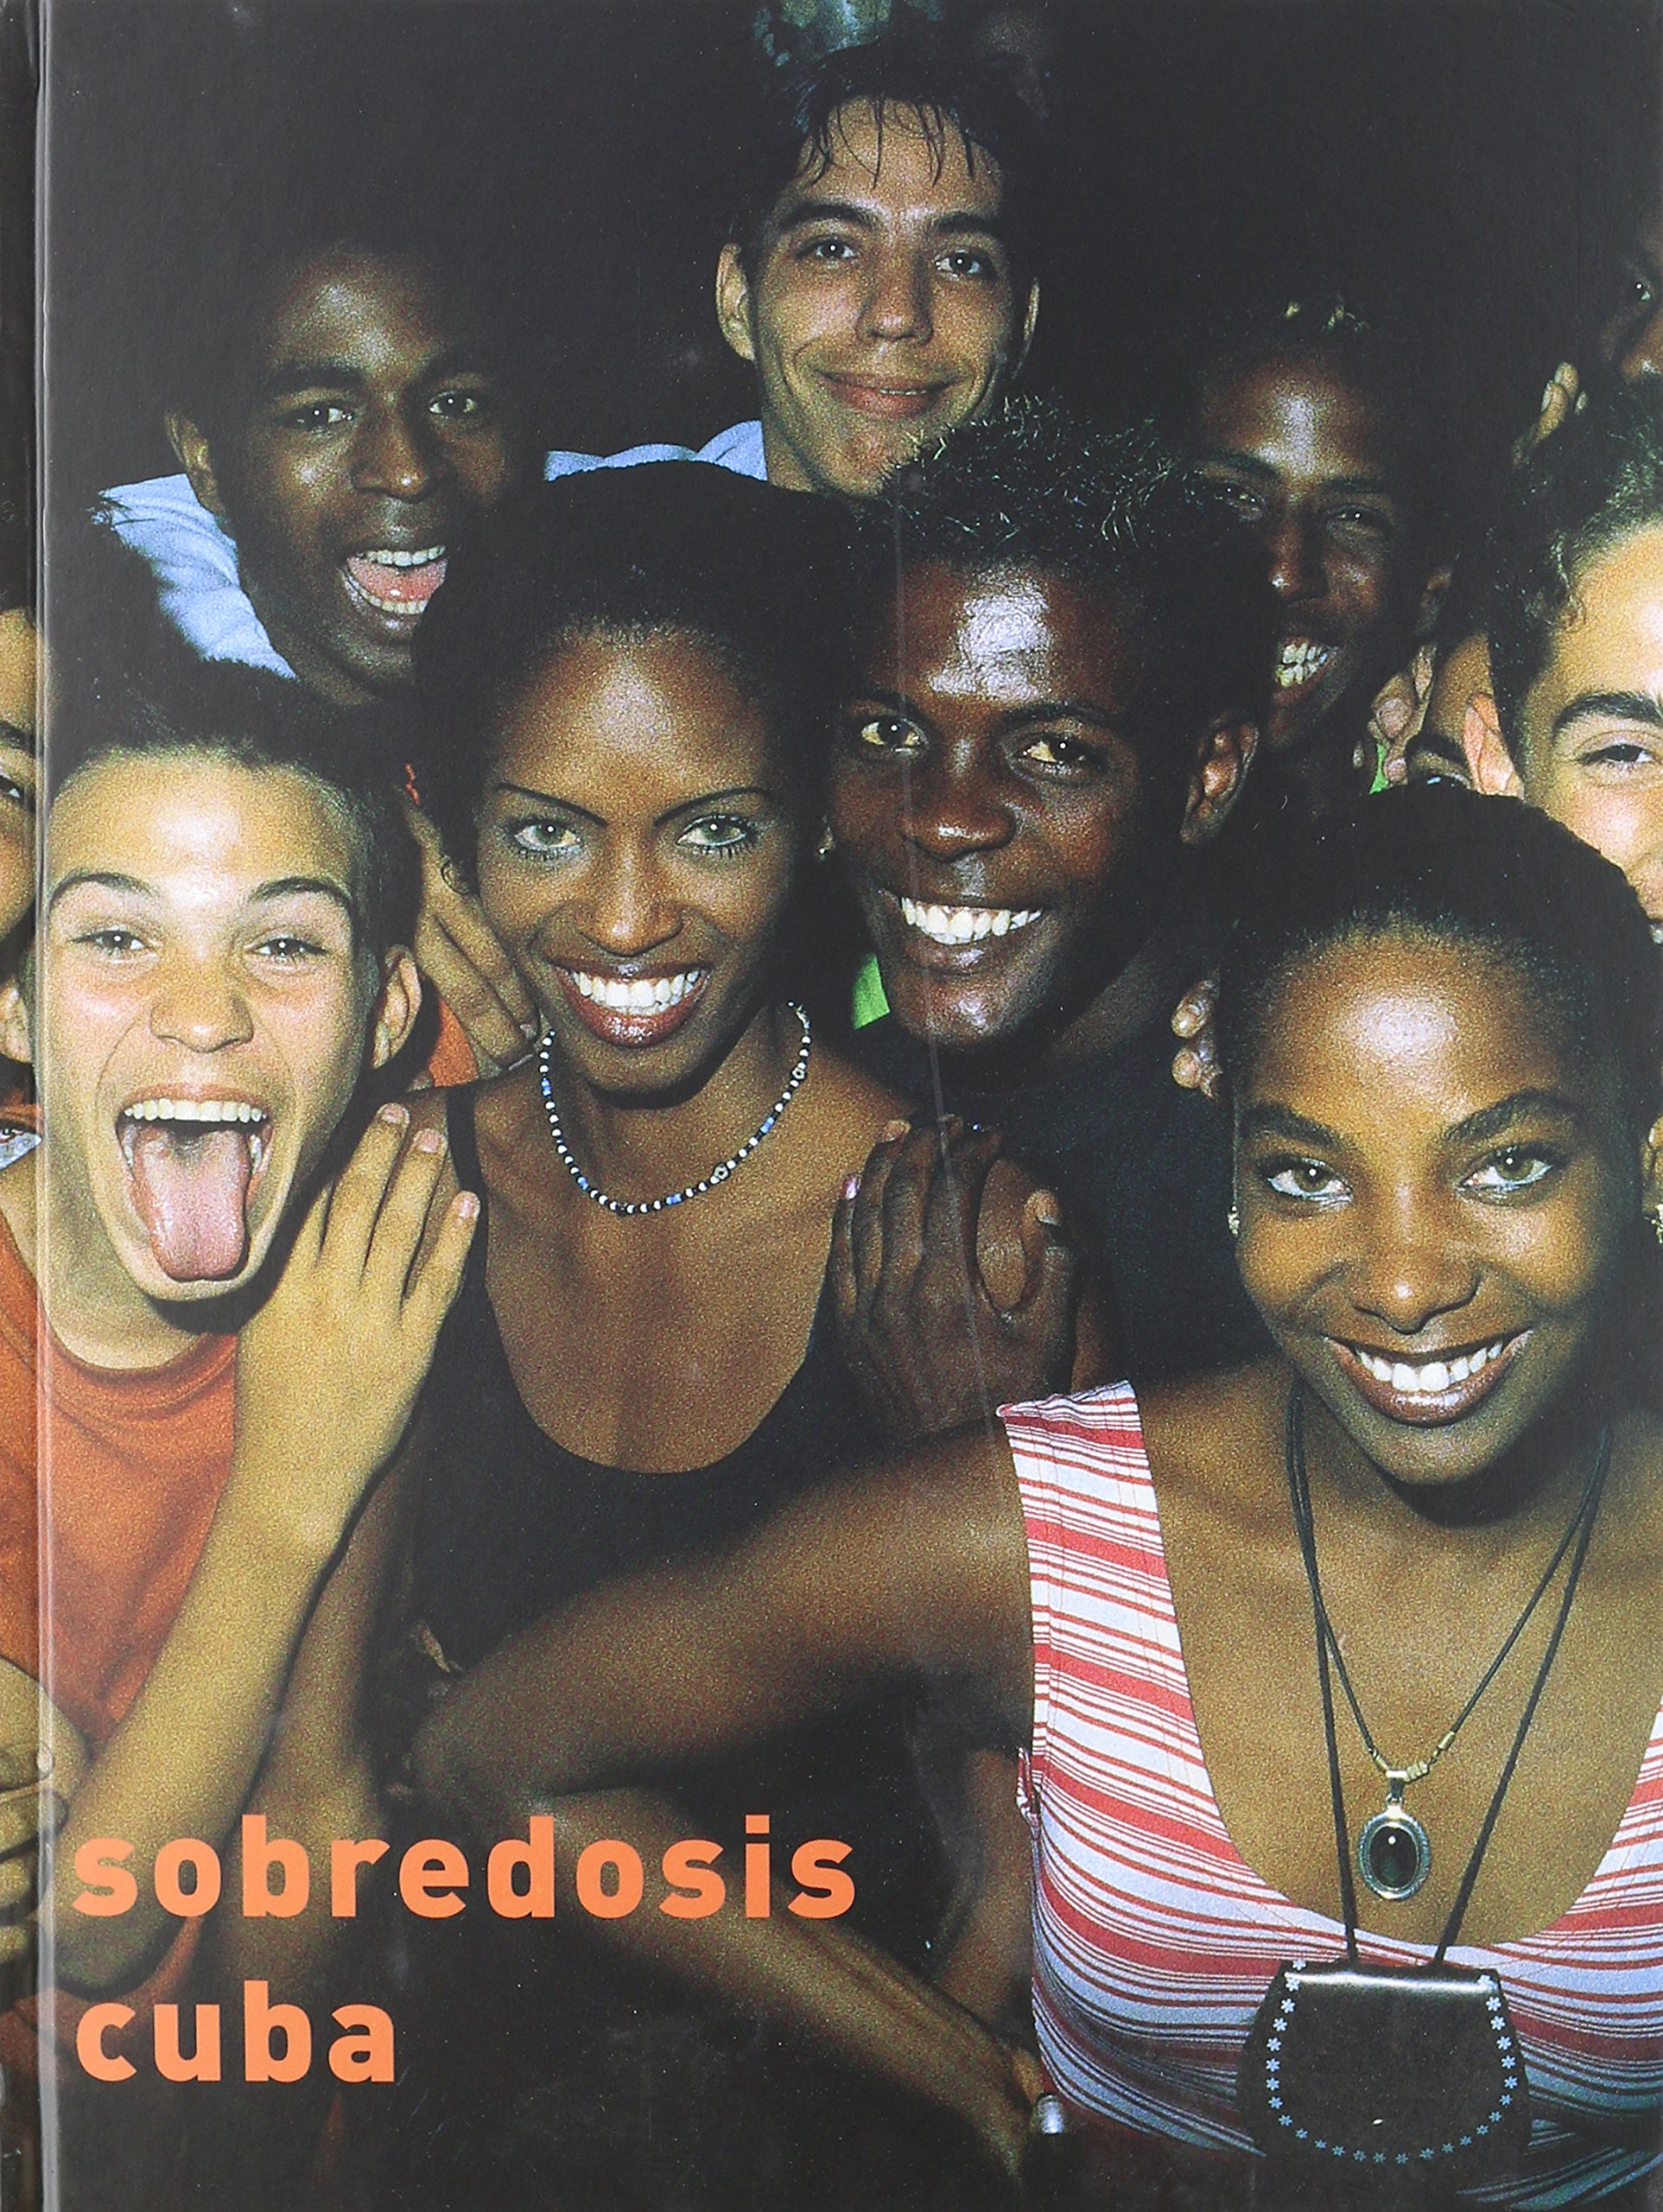 Sobredosis Cuba (Spanish Edition) by Oehrli Edition